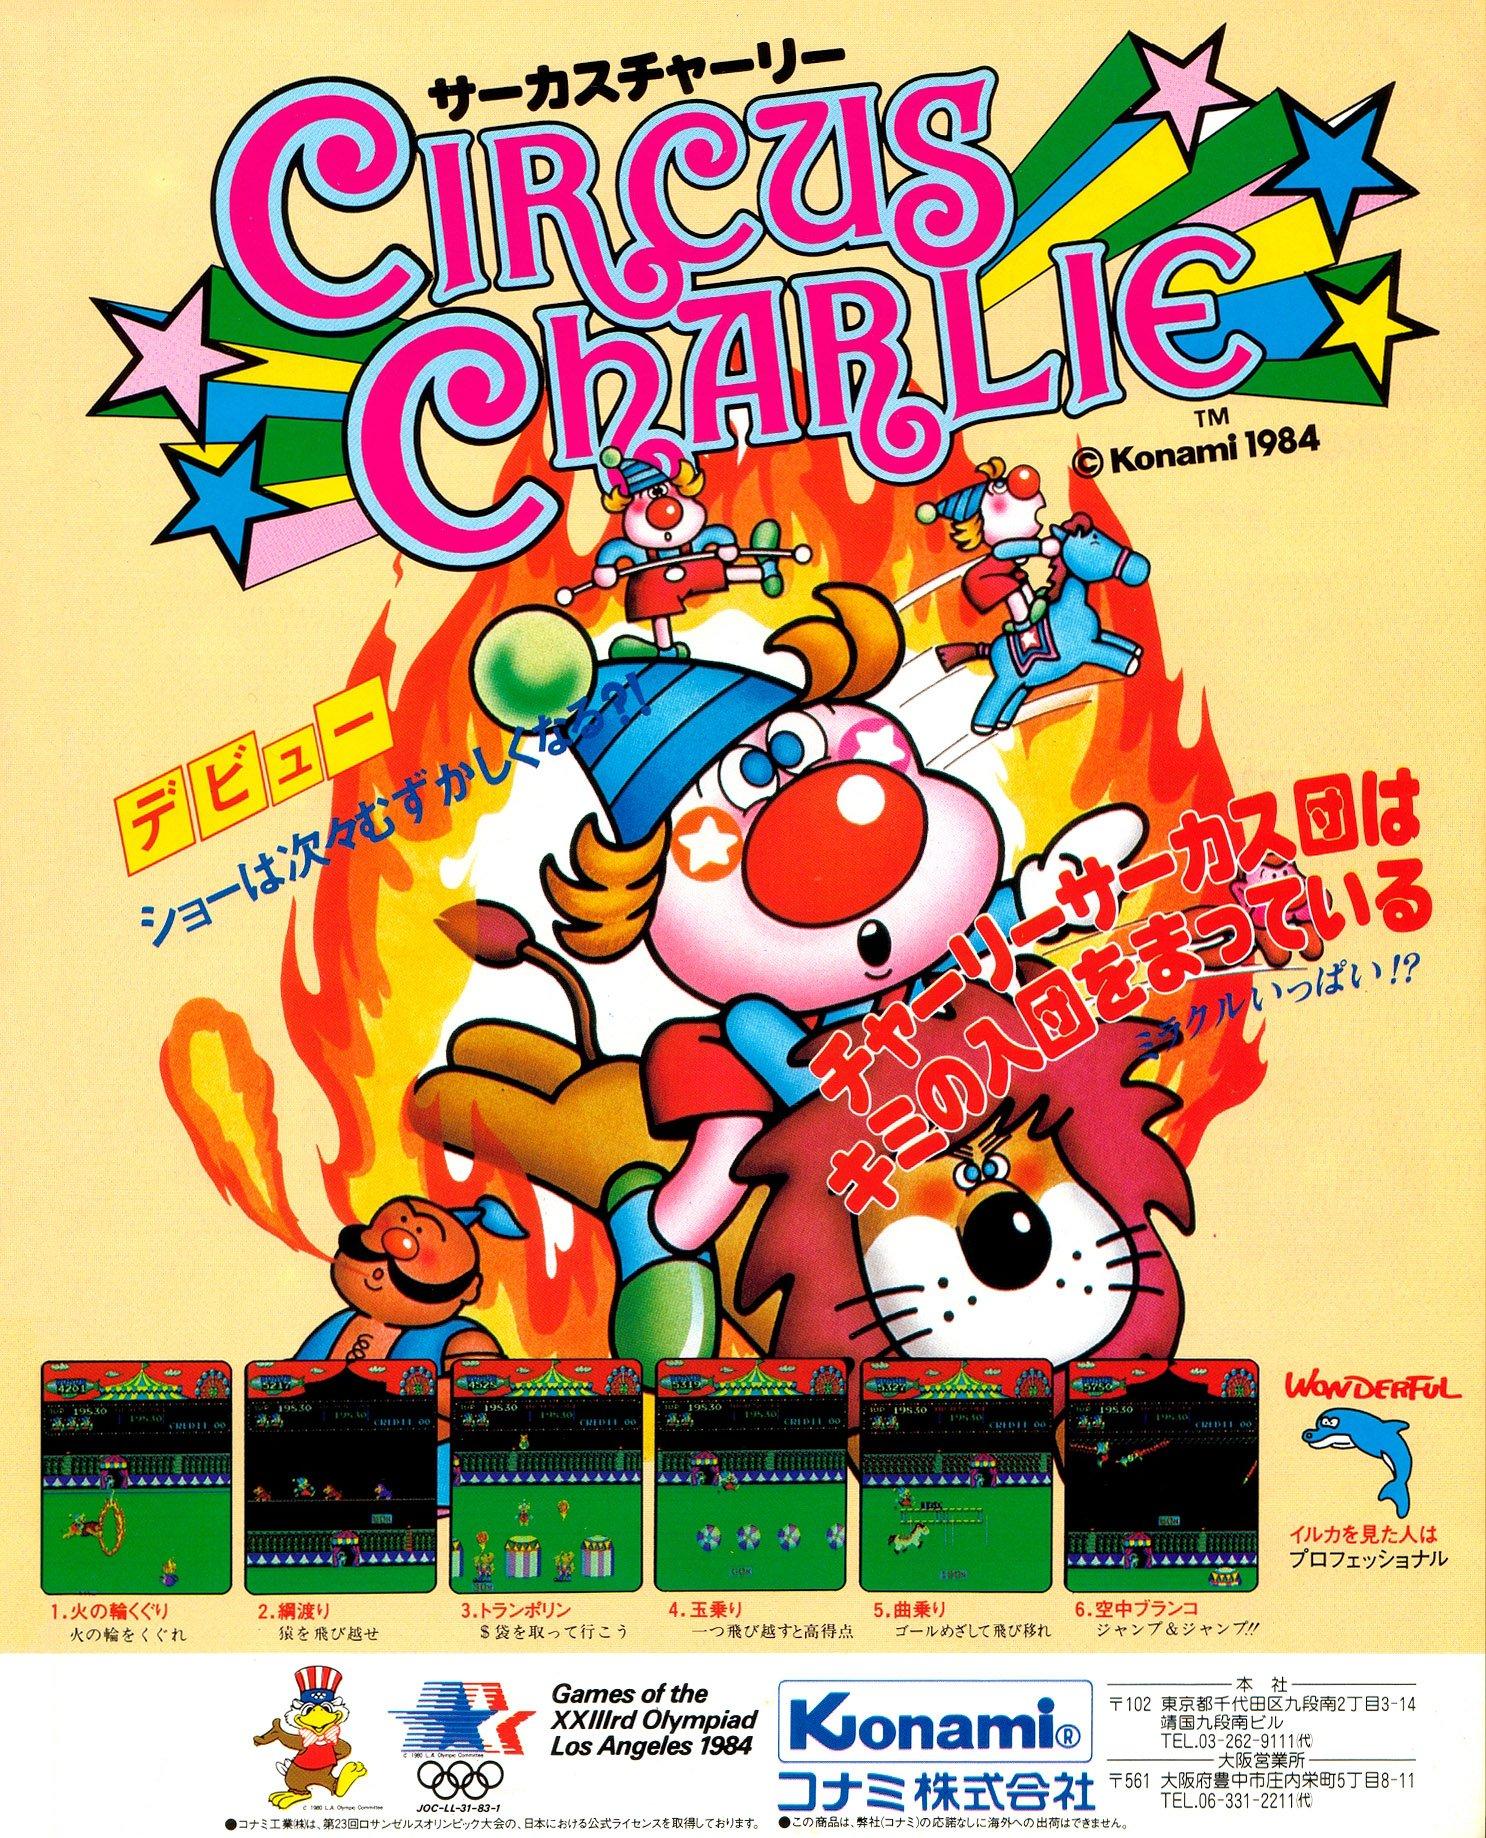 Circus Charlie (Japan)